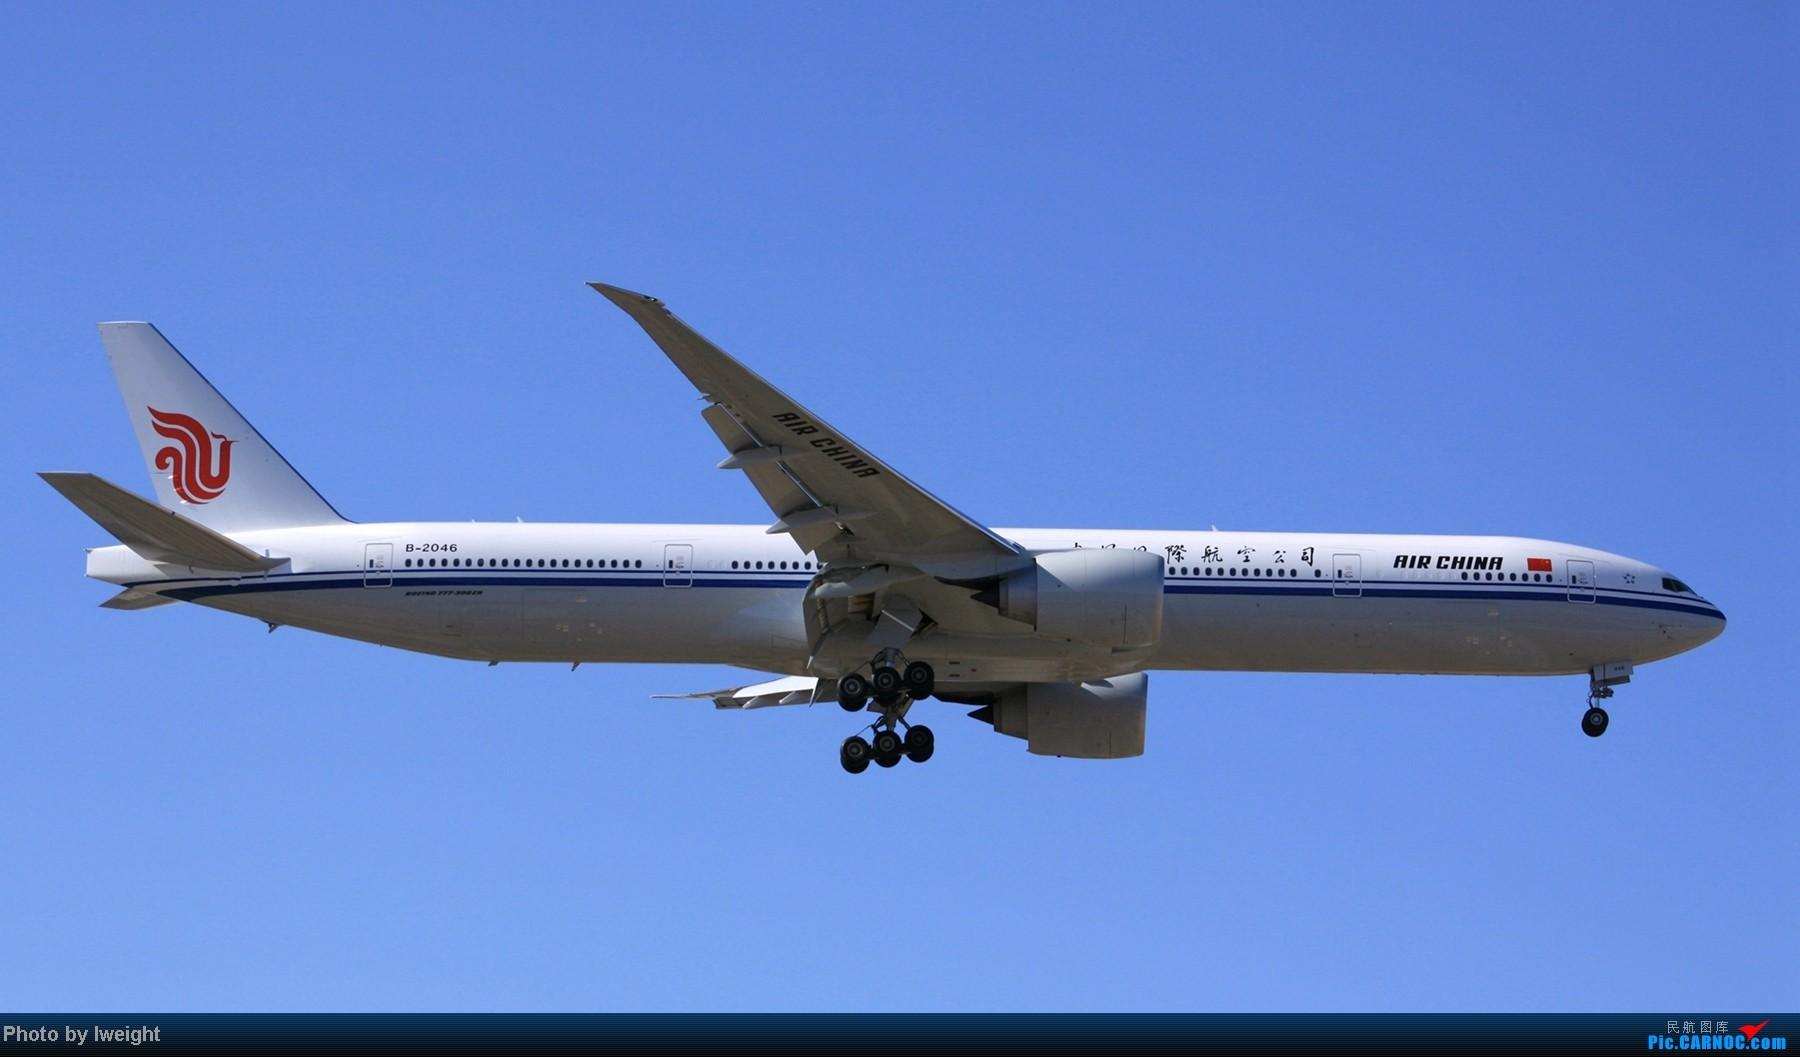 Re:[原创]春节期间首都机场拍机汇报 BOEING 777-300 B-2046 中国北京首都机场